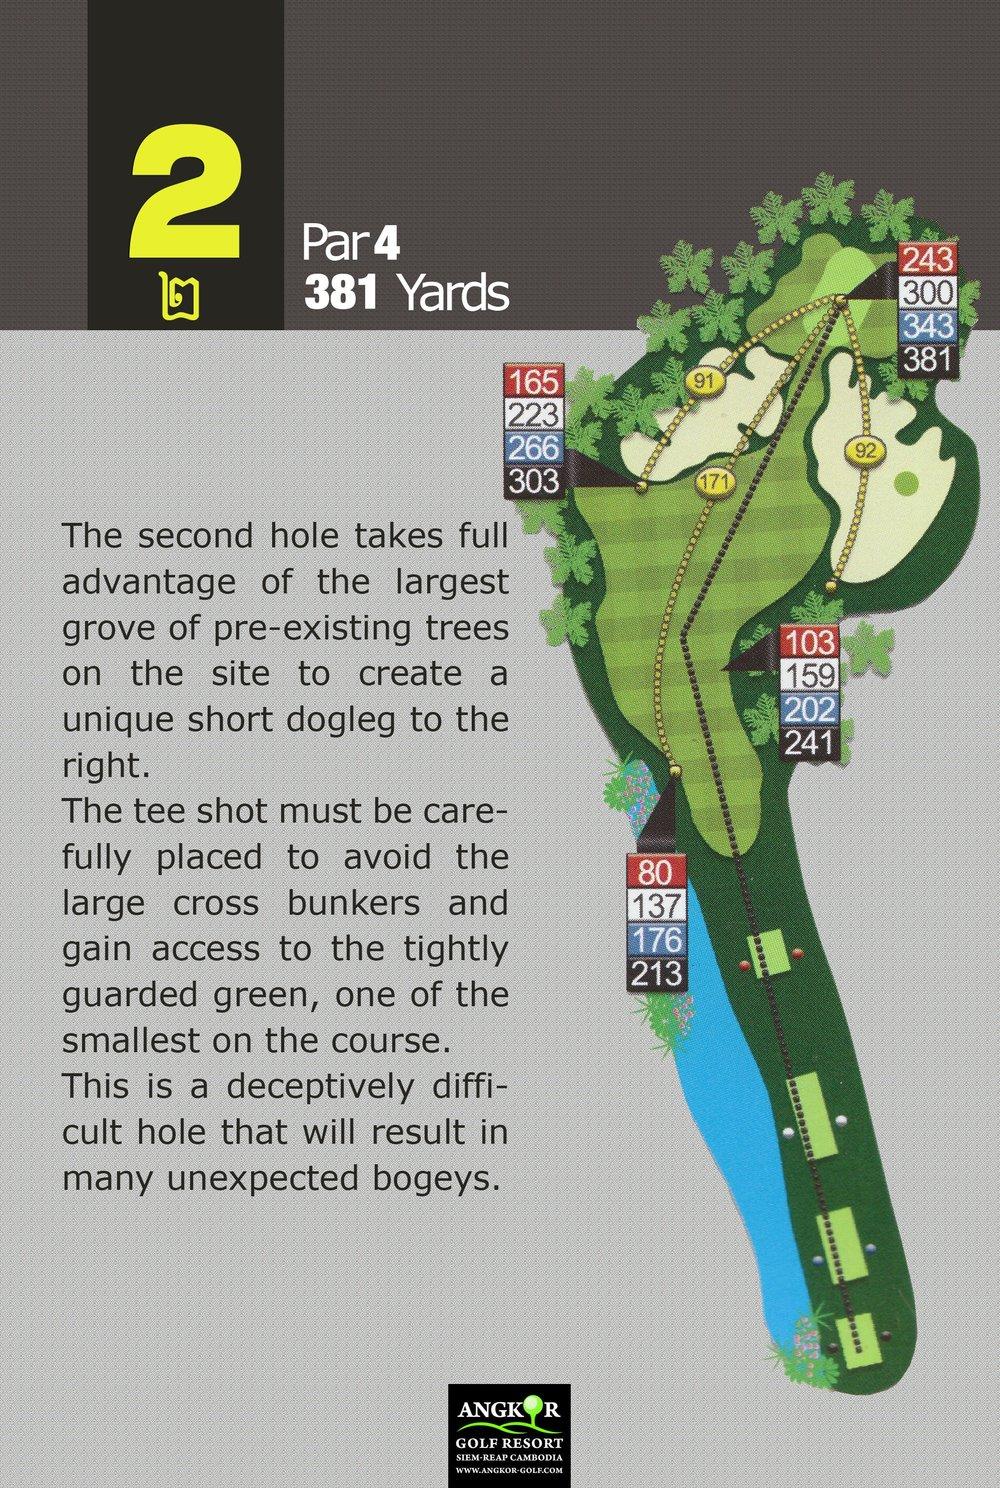 Hole 2 - Par 4 381 Yards